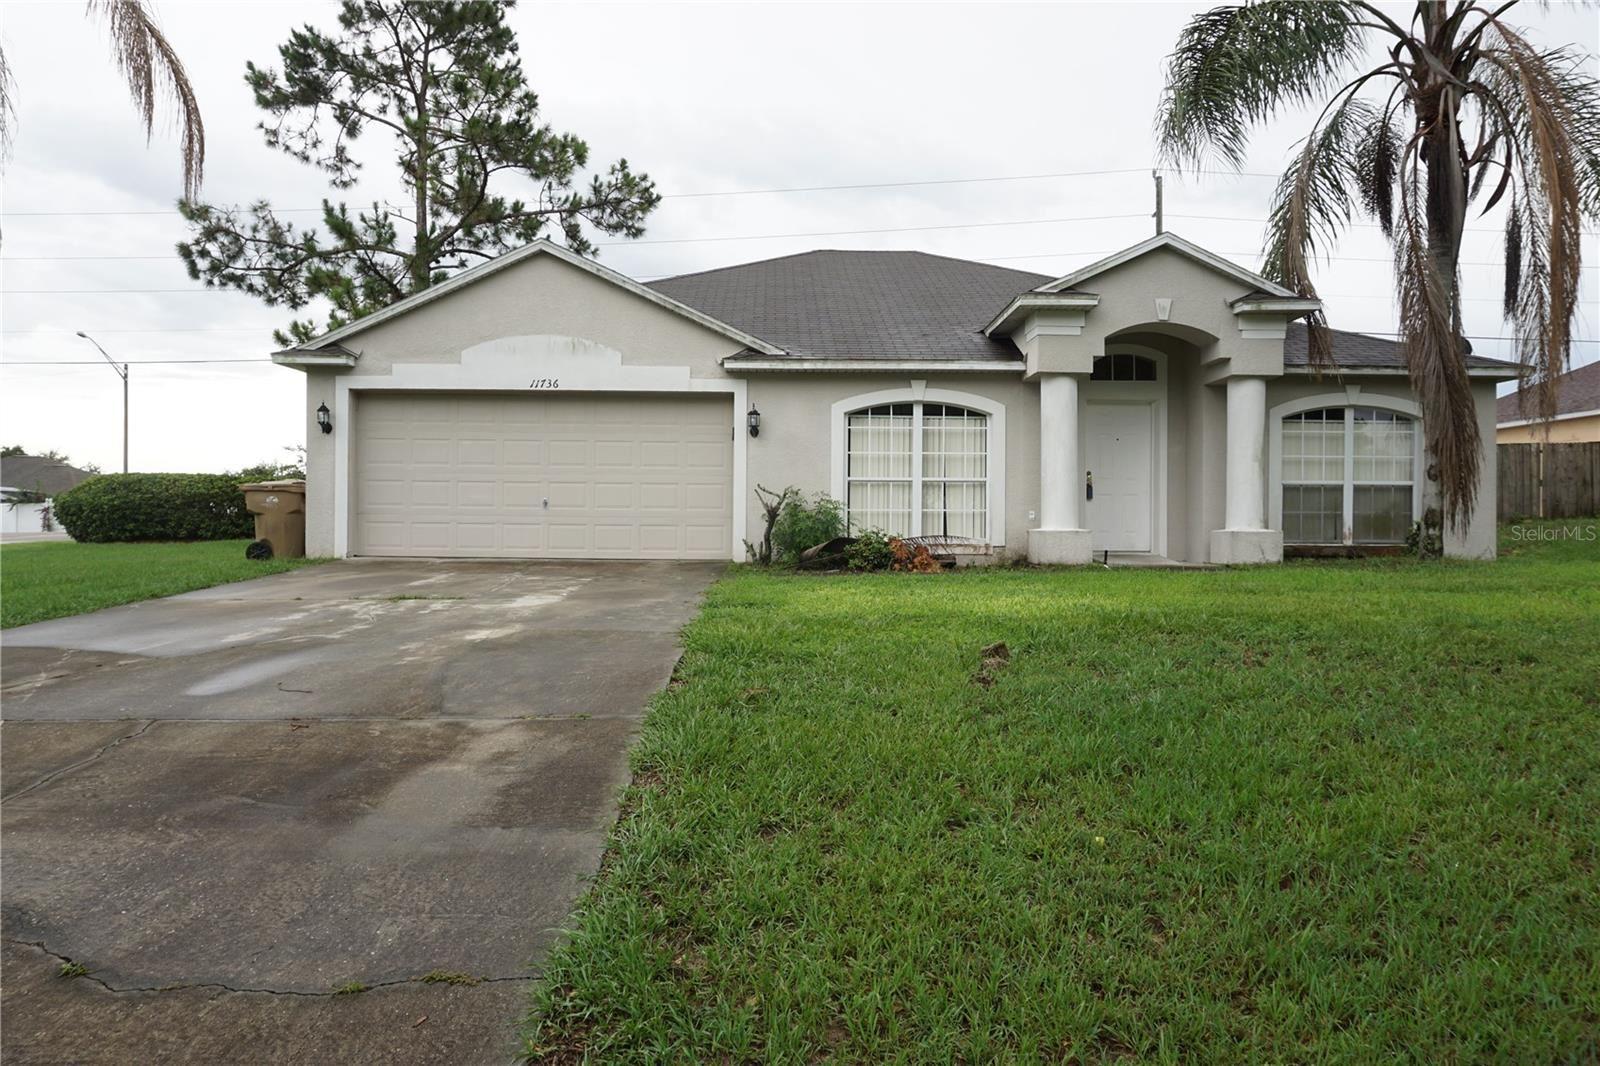 11736 PINELOCH LOOP, Clermont, FL 34711 - MLS#: O5955704